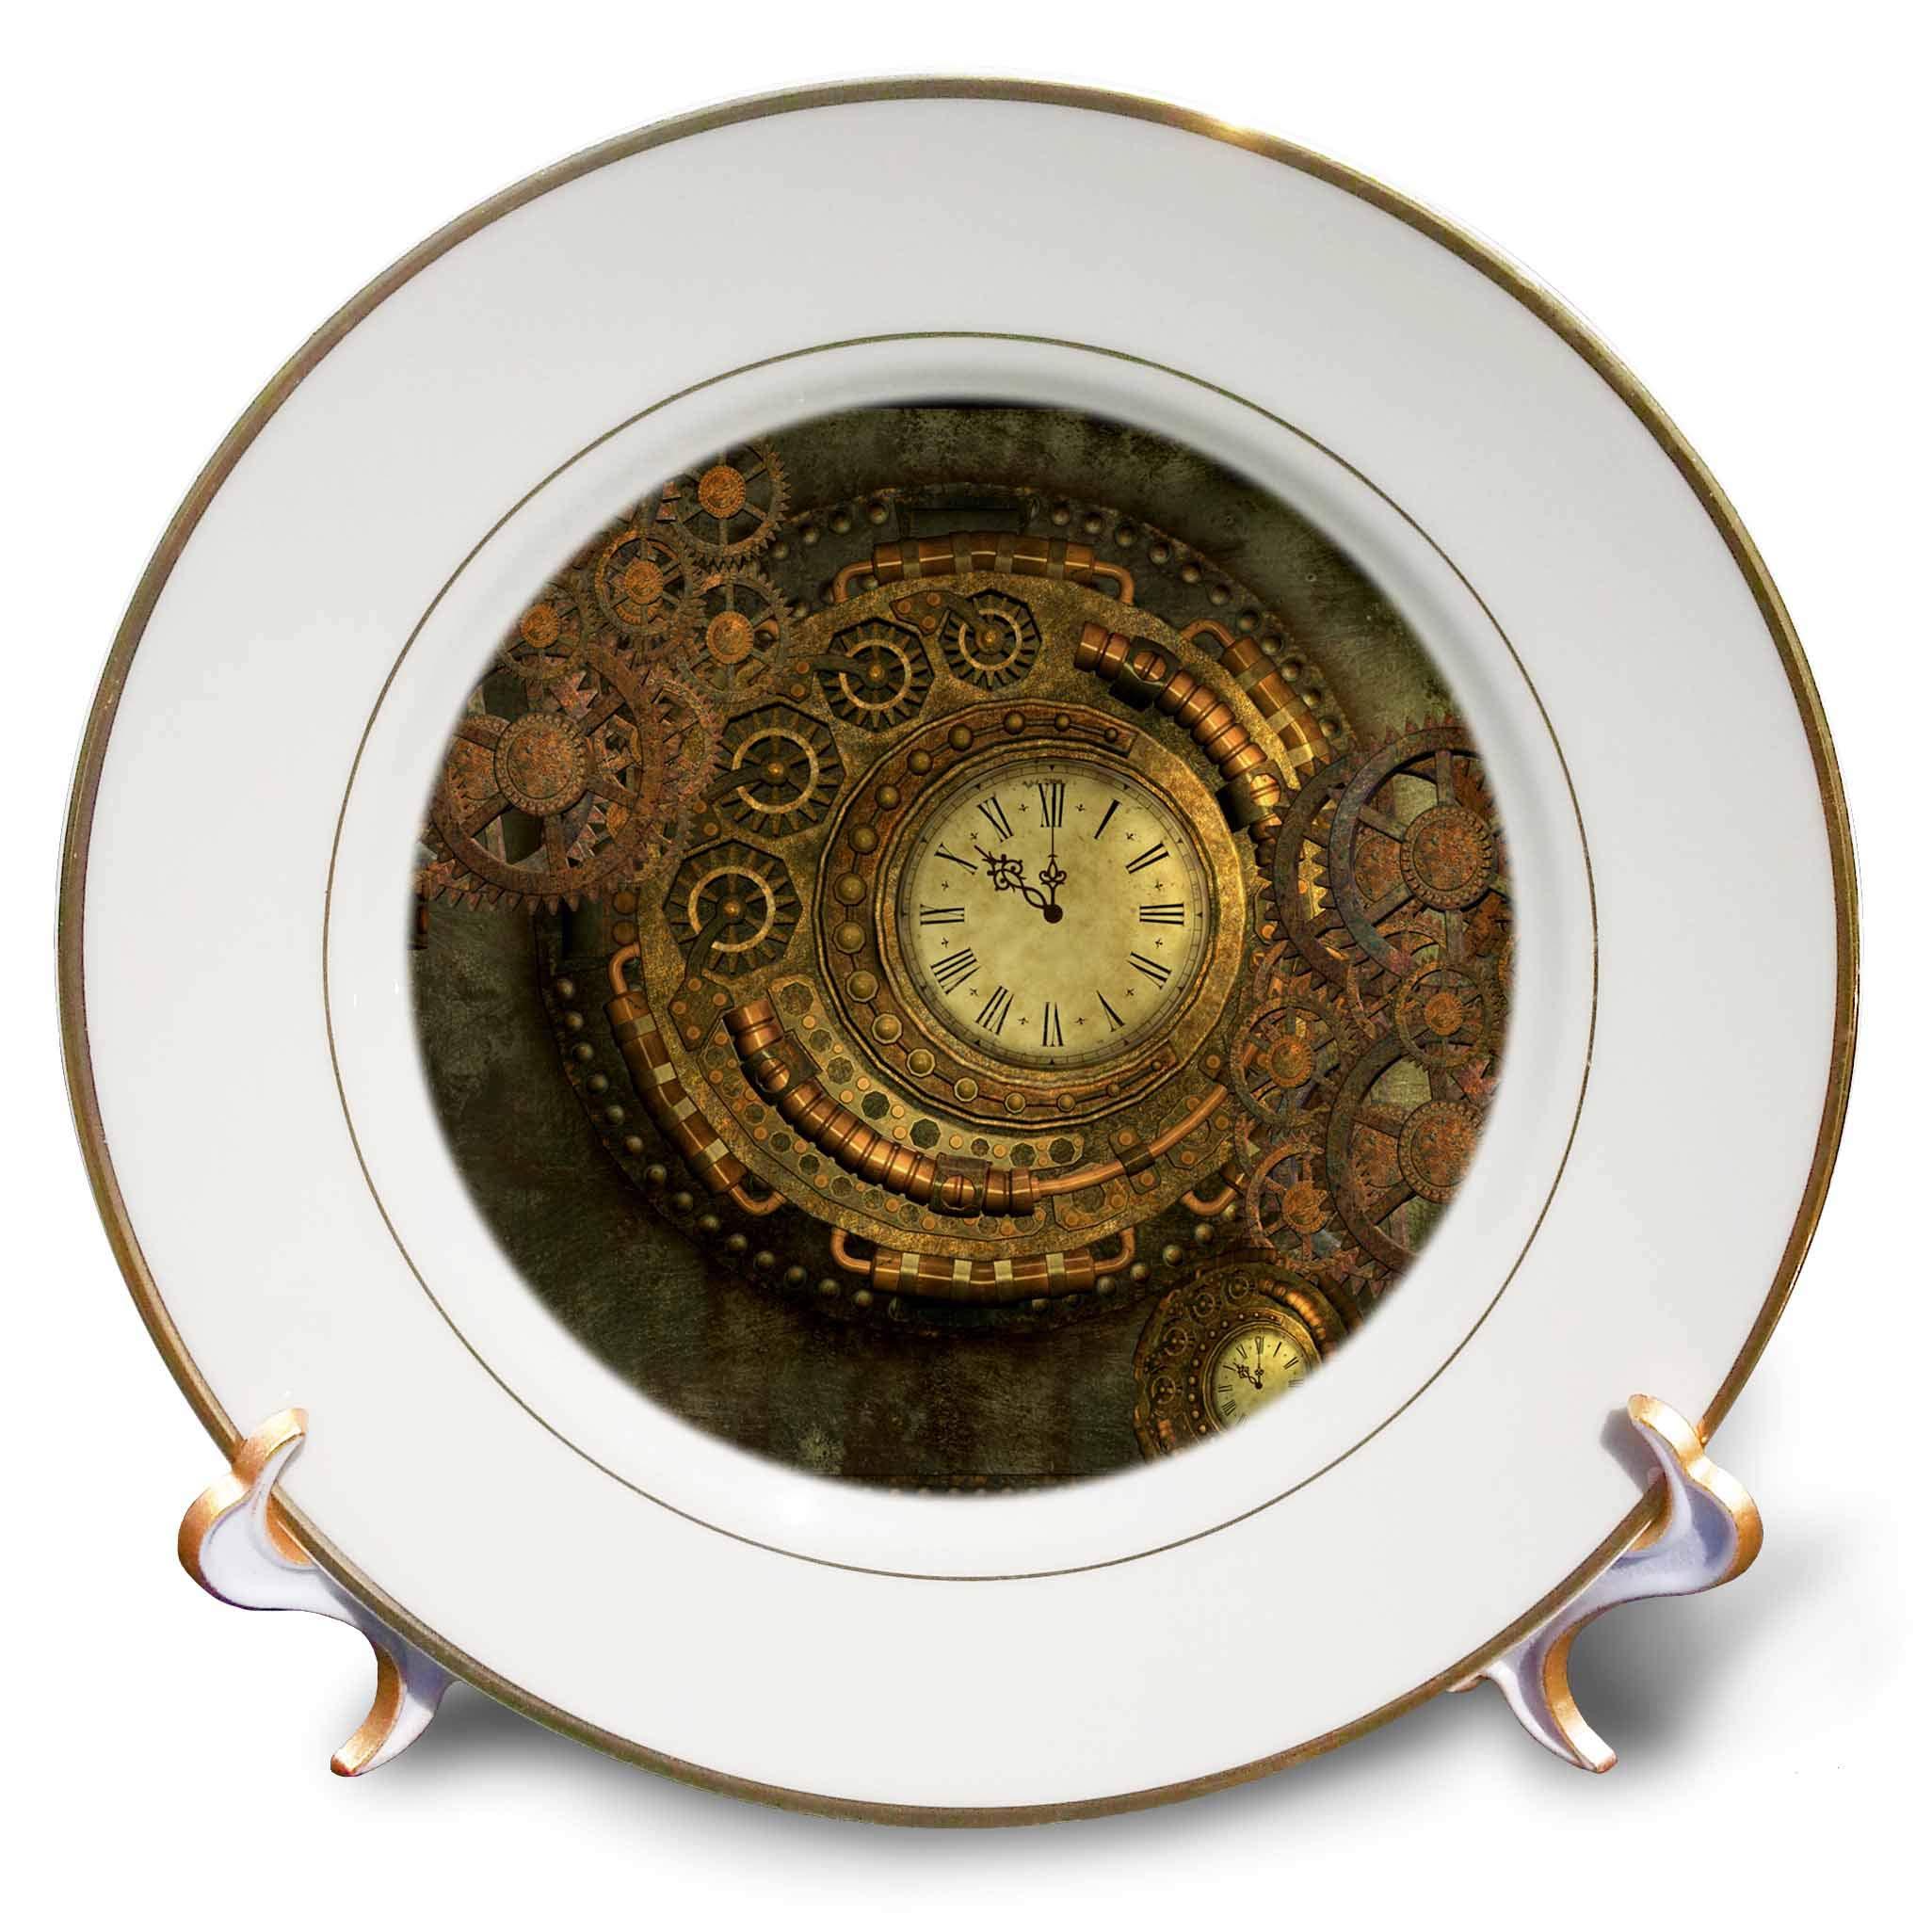 3dRose Heike Köhnen Design Steampunk - Wonderful Clockwork, Steampunk Design, Golden Colors - 8 inch Porcelain Plate (cp_293087_1)